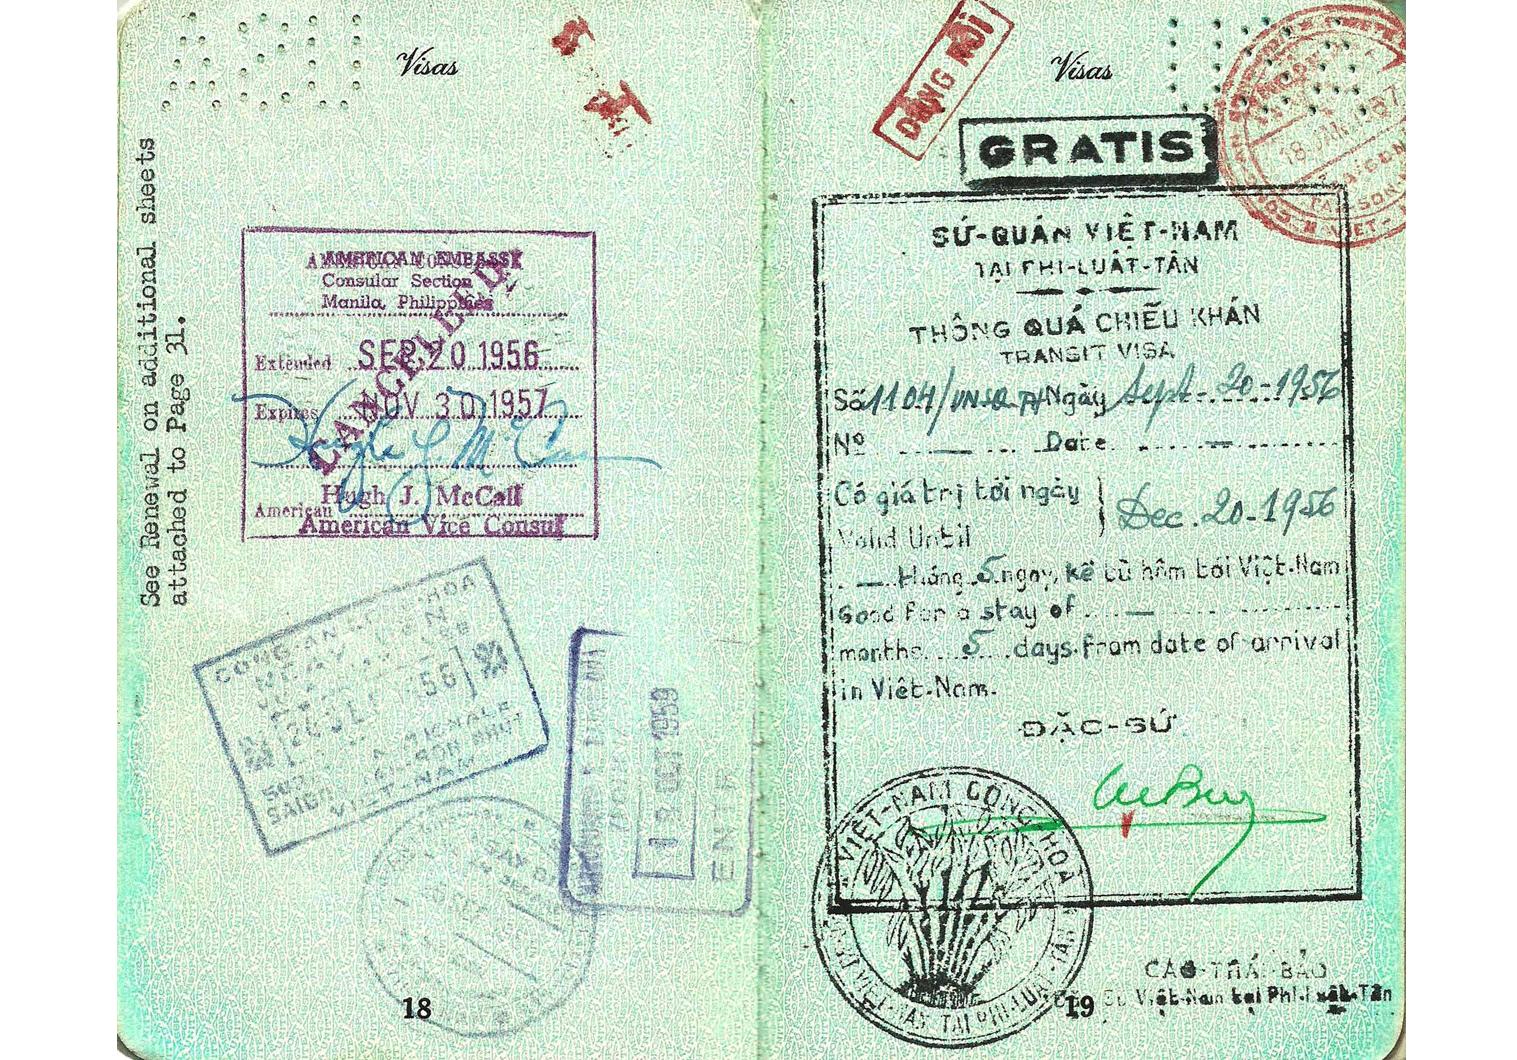 official Vietnamese visa.